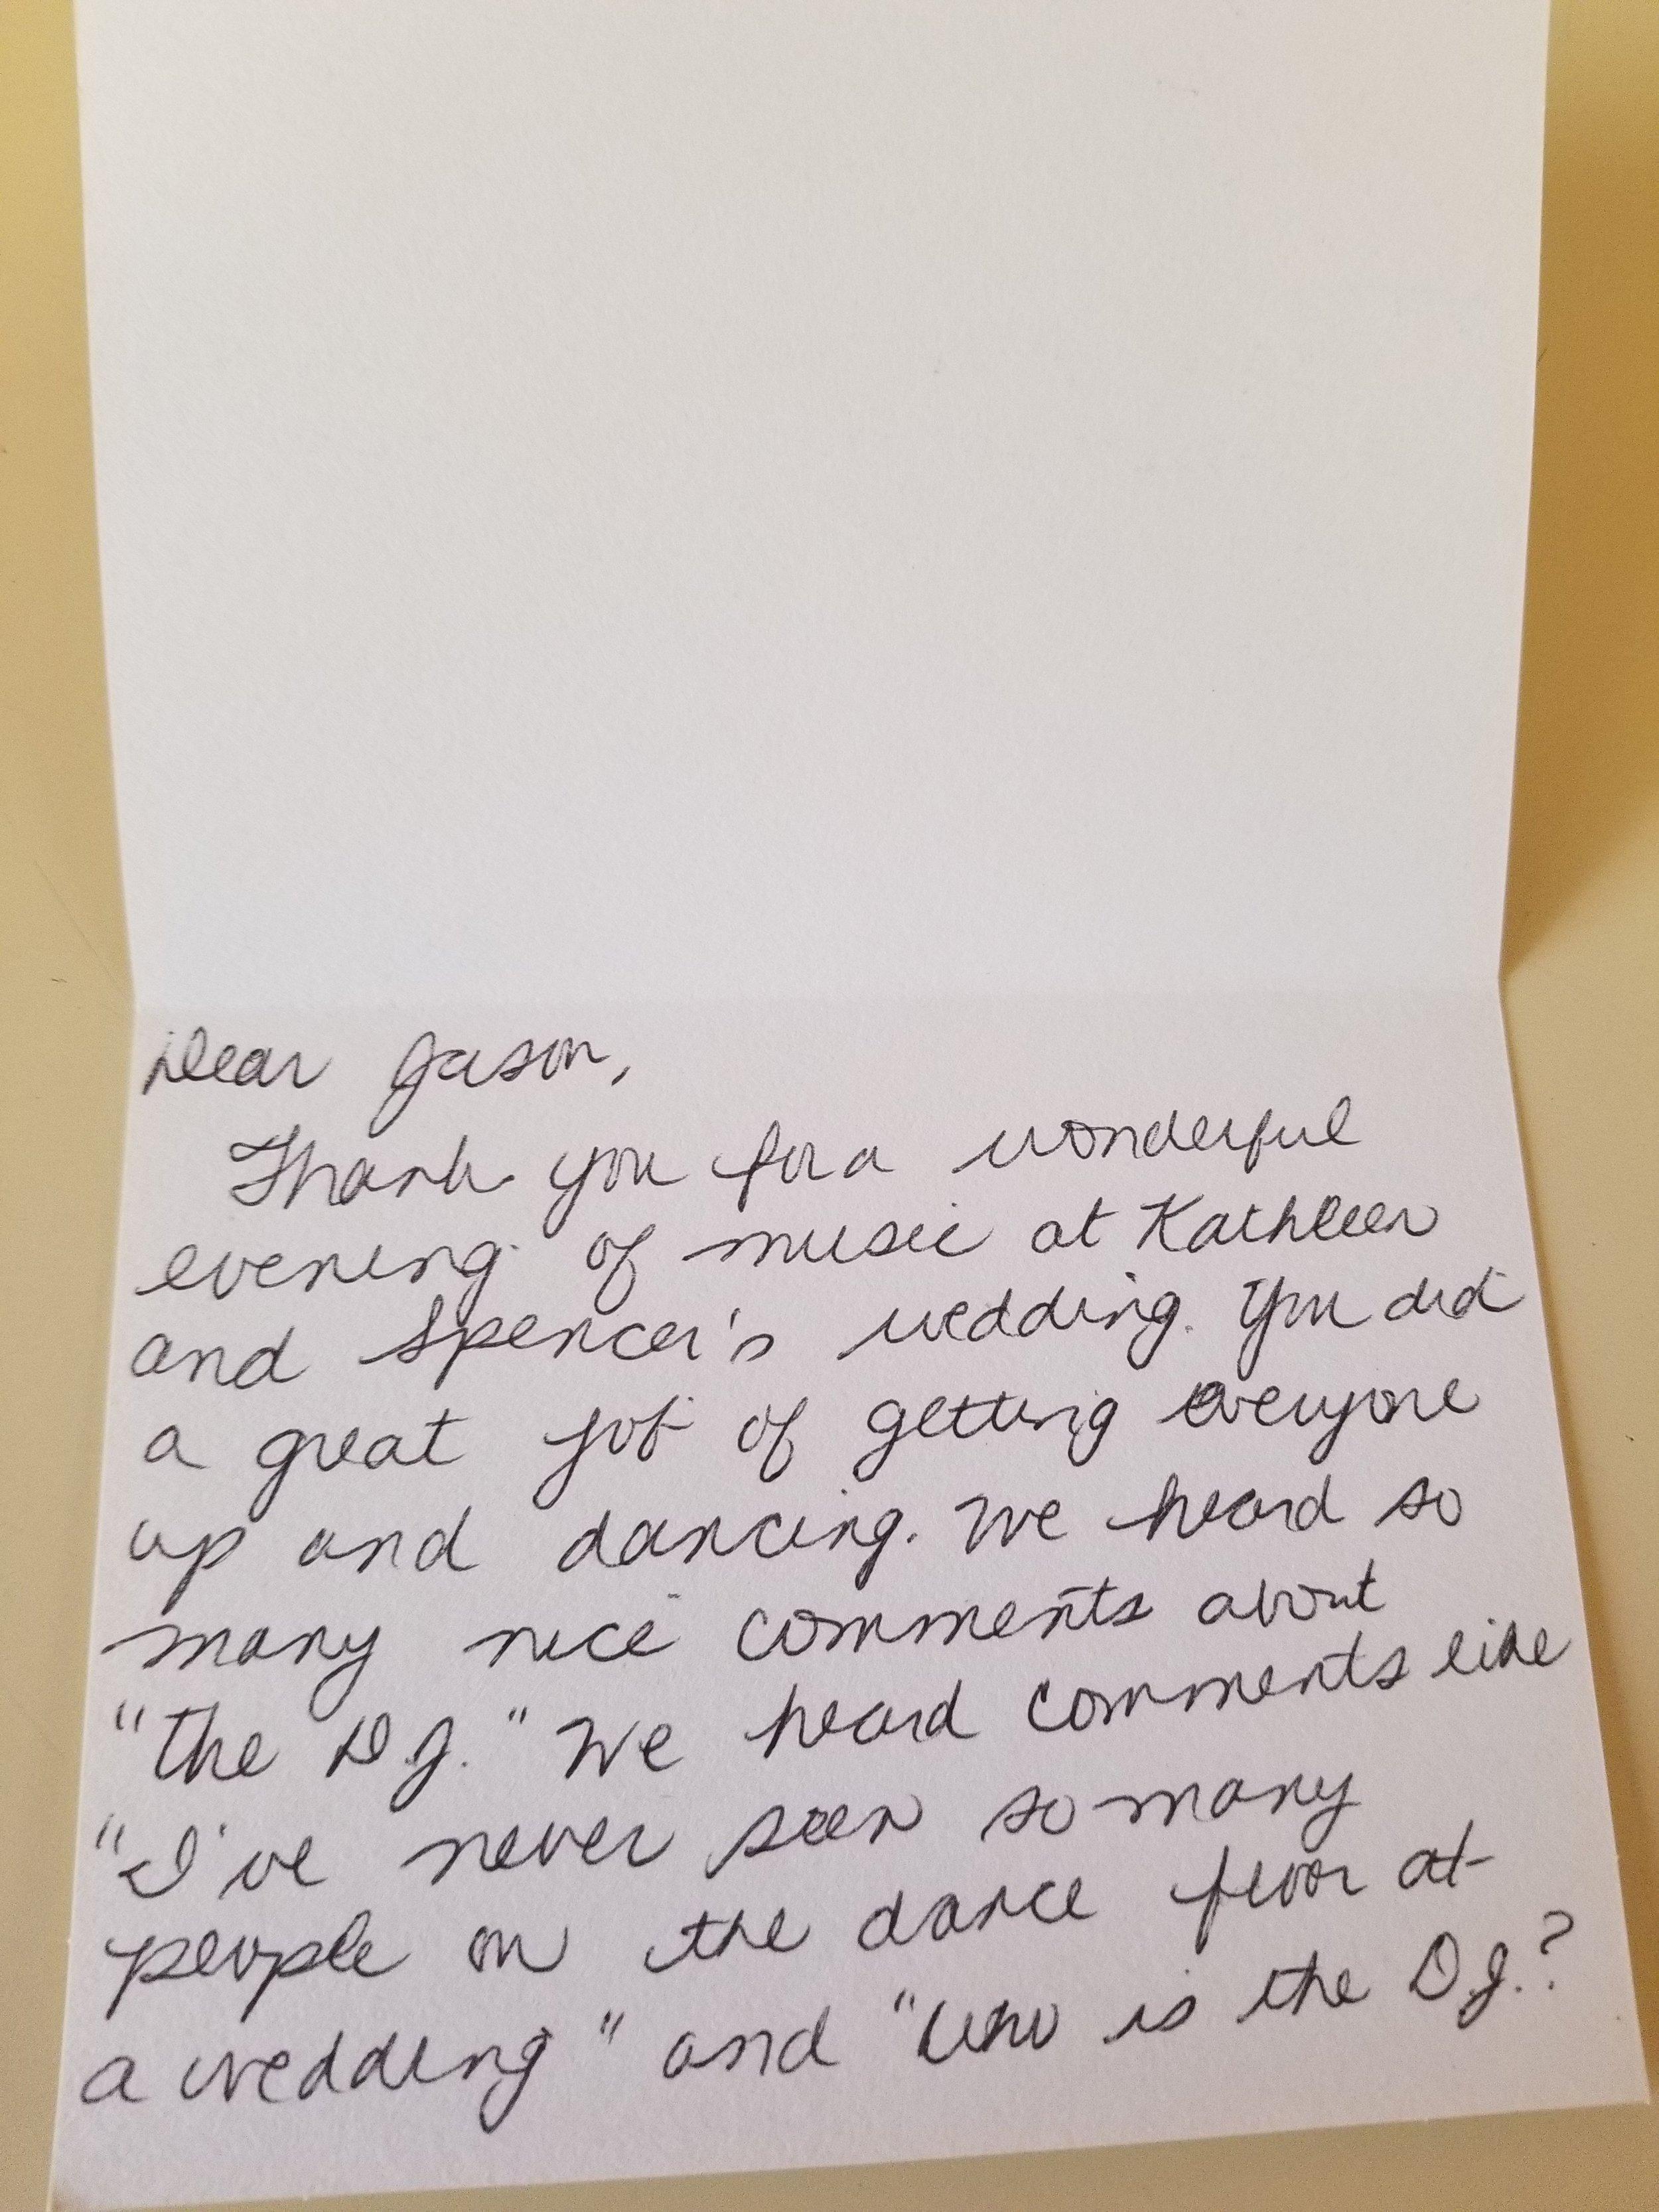 Bills, bills, junk mail, bills… parental approval thank you notes?  Priceless.